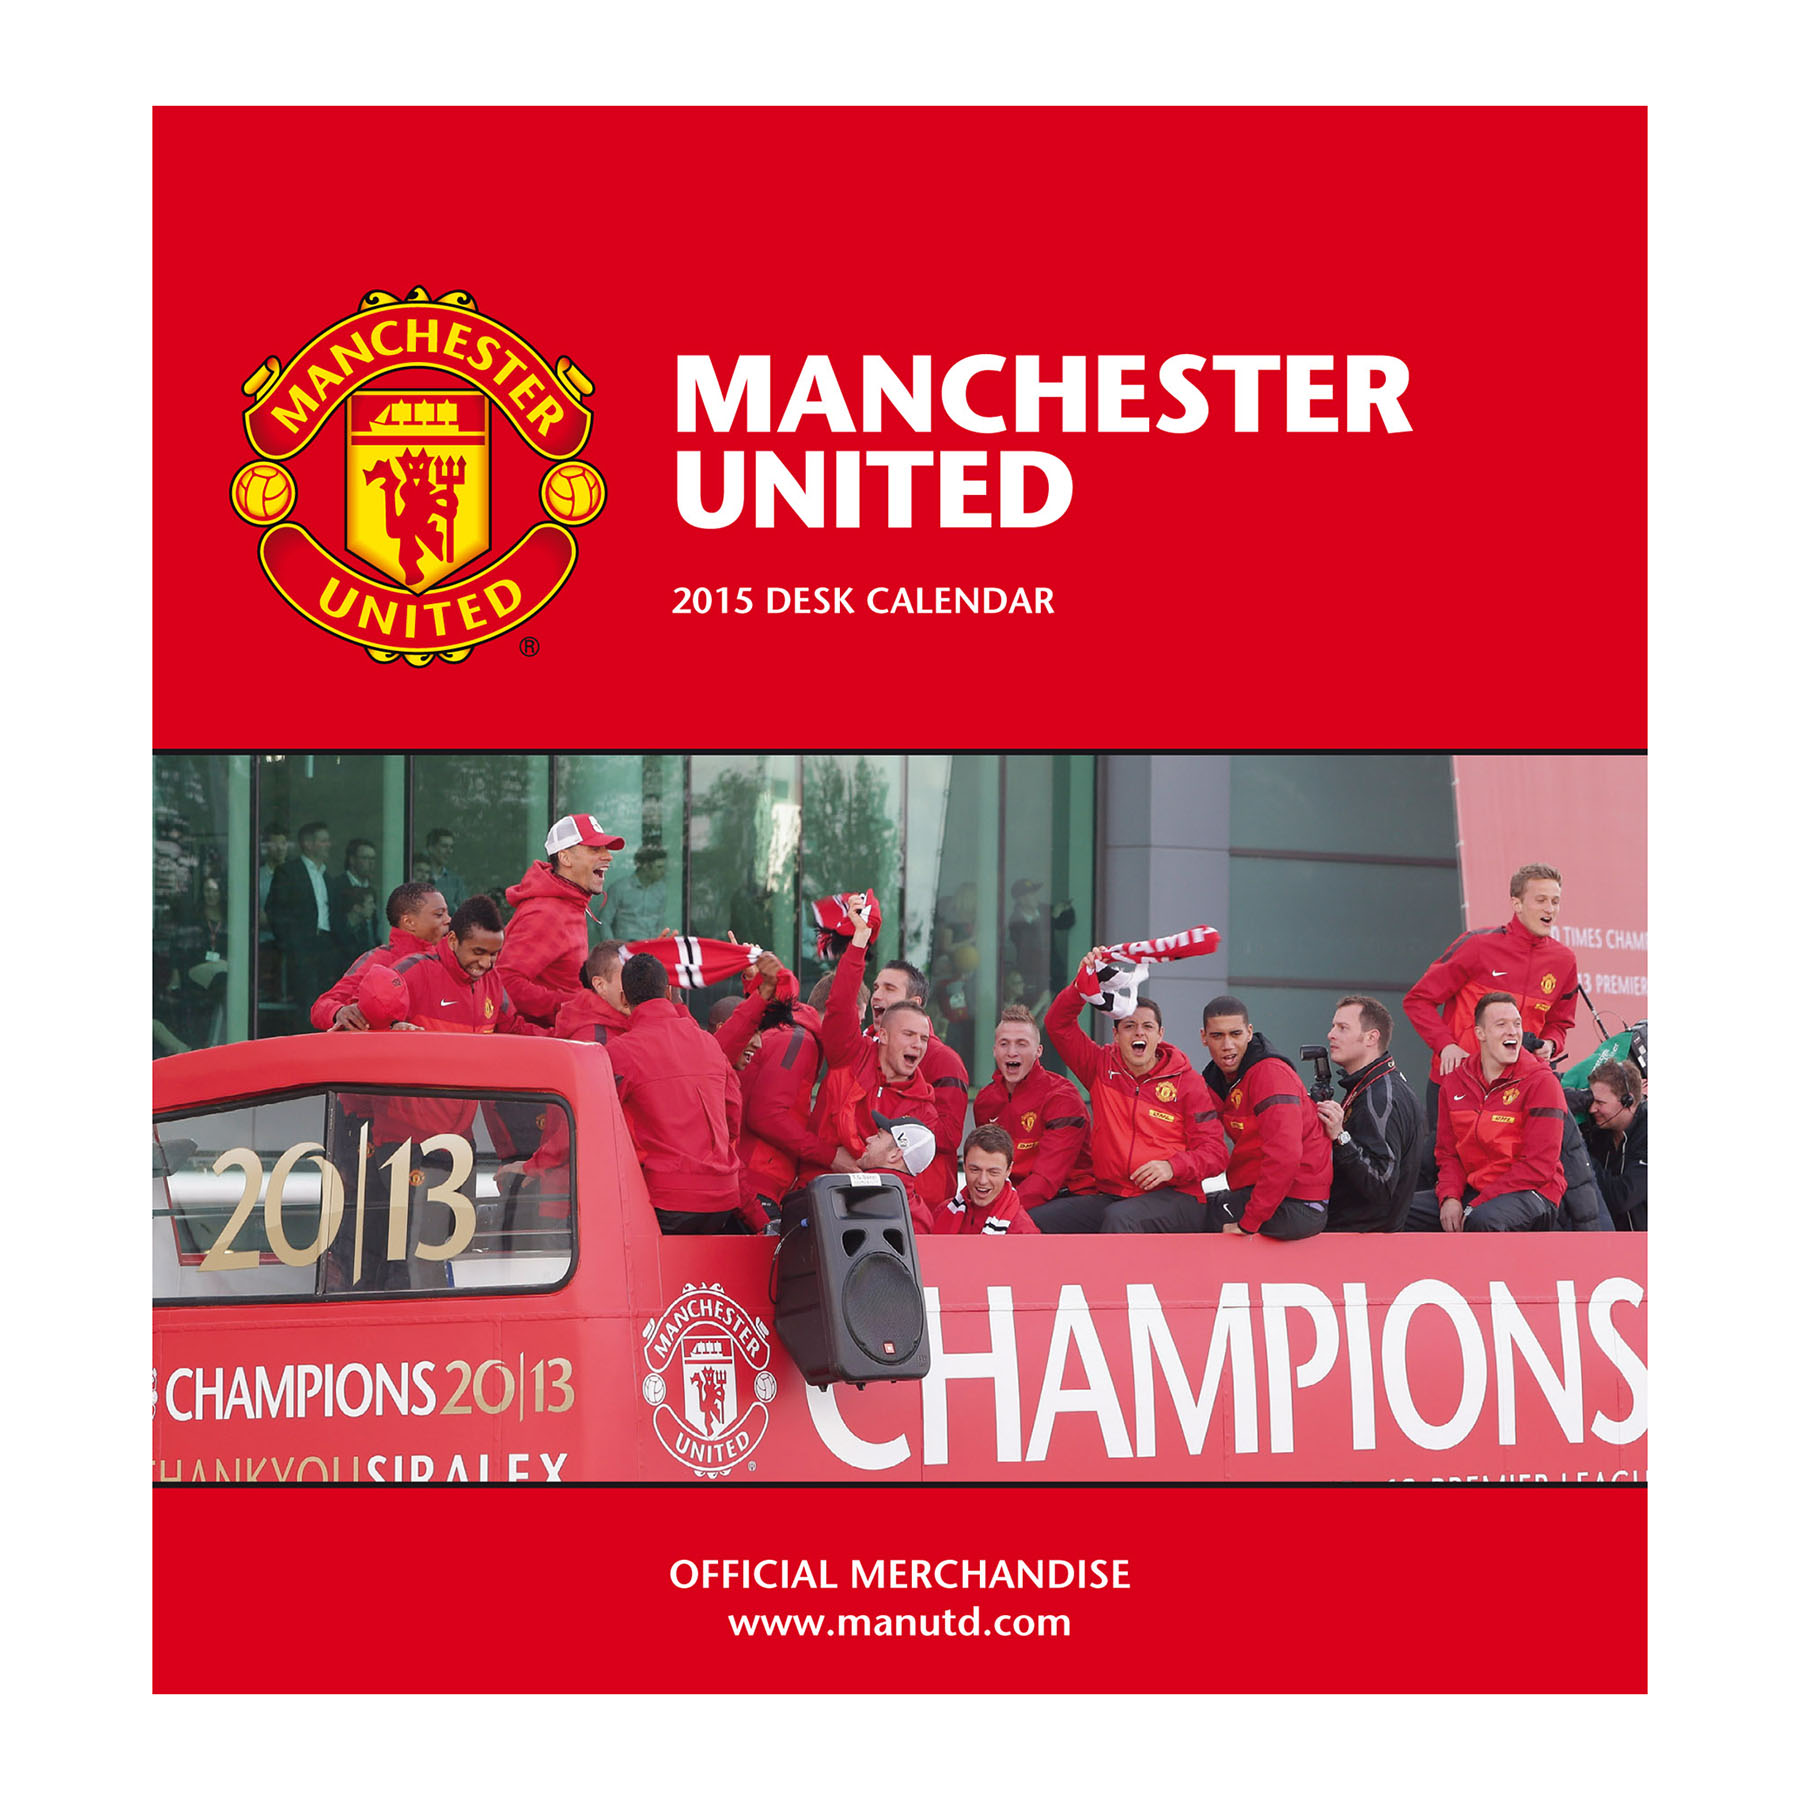 Manchester United 2015 Desk Calendar